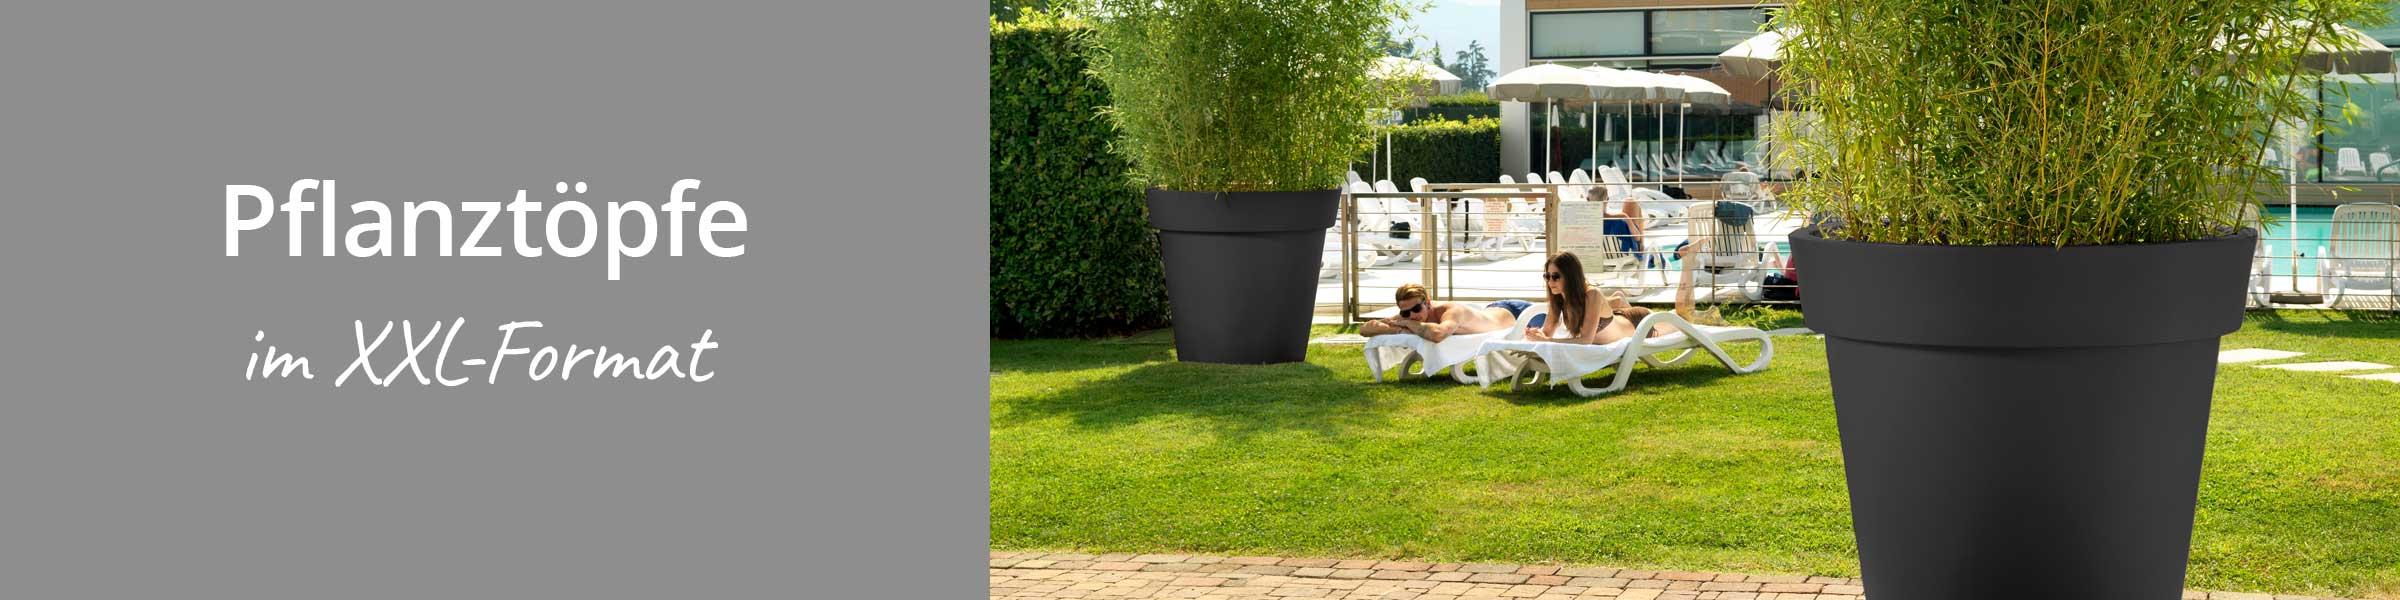 pflanzgef e bert pfe top auswahl gleich bestellen dehner. Black Bedroom Furniture Sets. Home Design Ideas